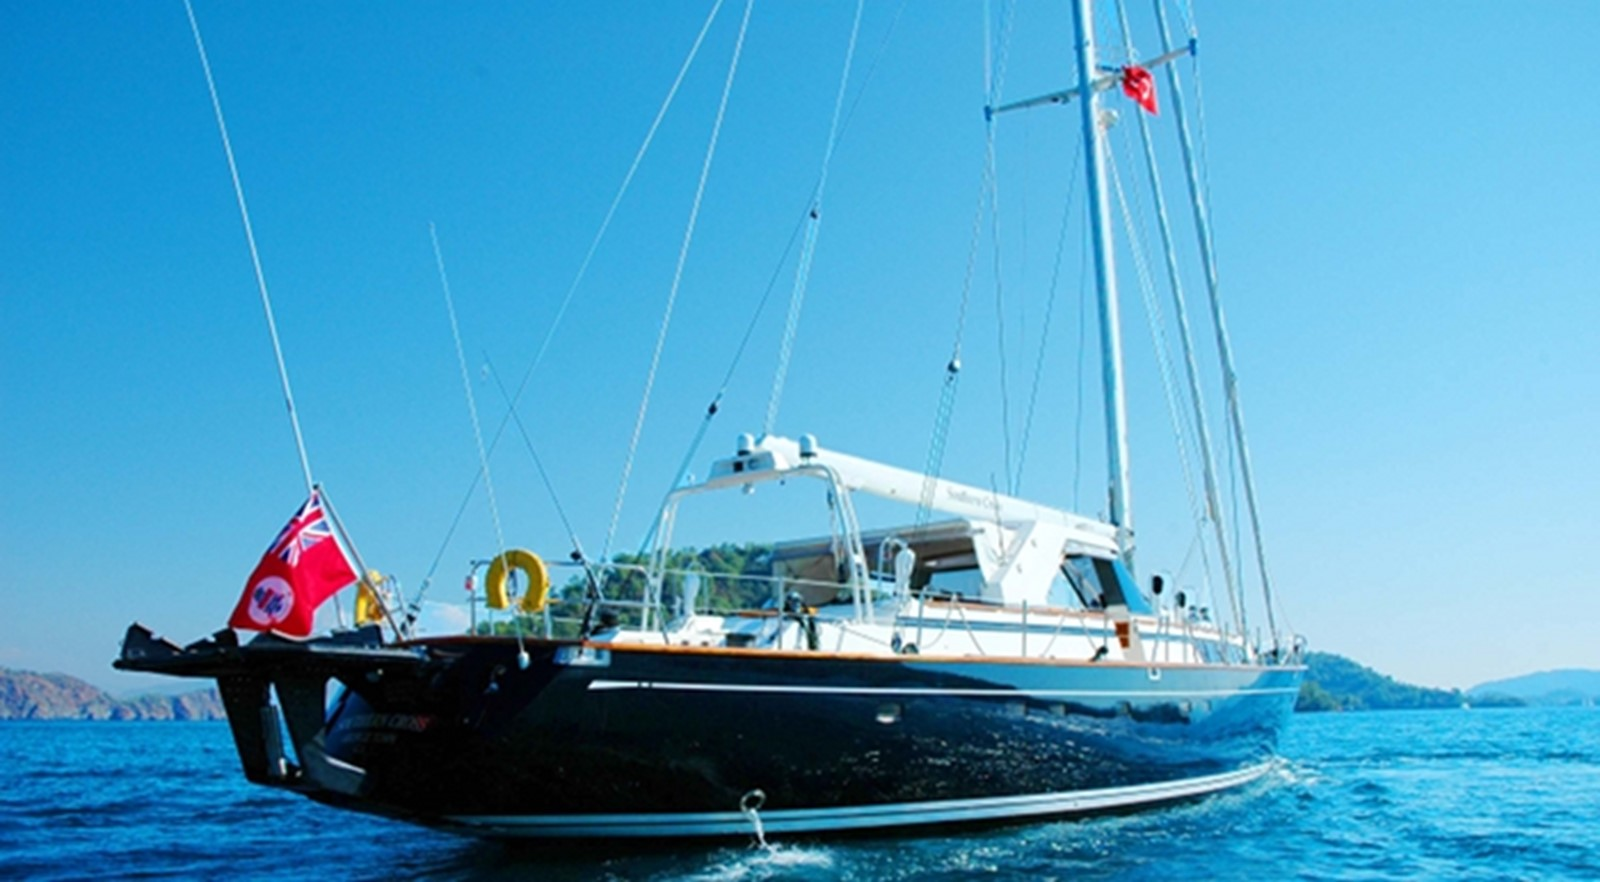 1991 CIM SHIPYARD MAXI 88 Cutter Sloop Cruising Sailboat 2371548